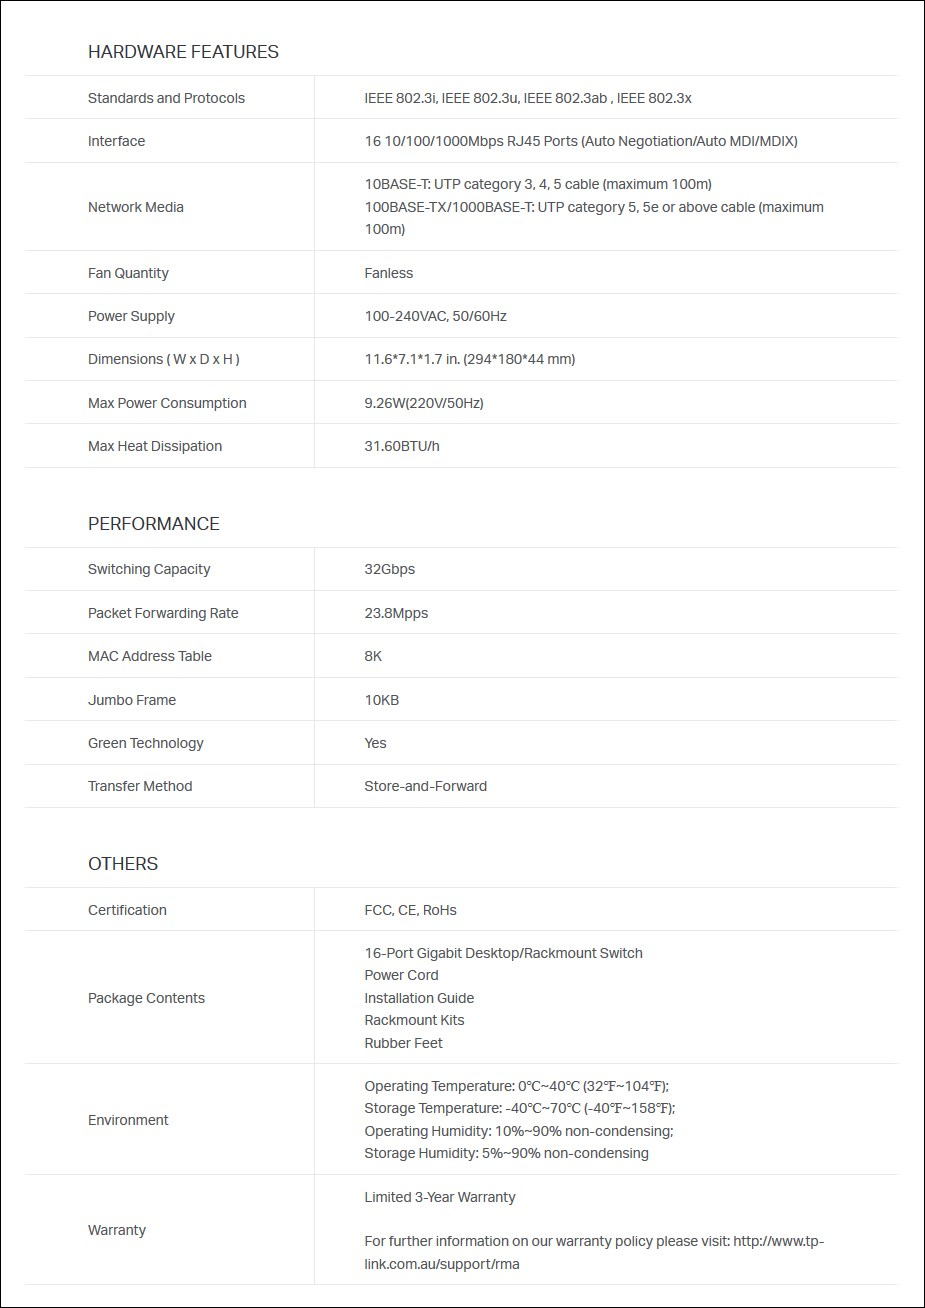 TP-Link TL-SG1016D 16-Port Gigabit Desktop / Rackmount Switch - Metal Housing - Overview 2